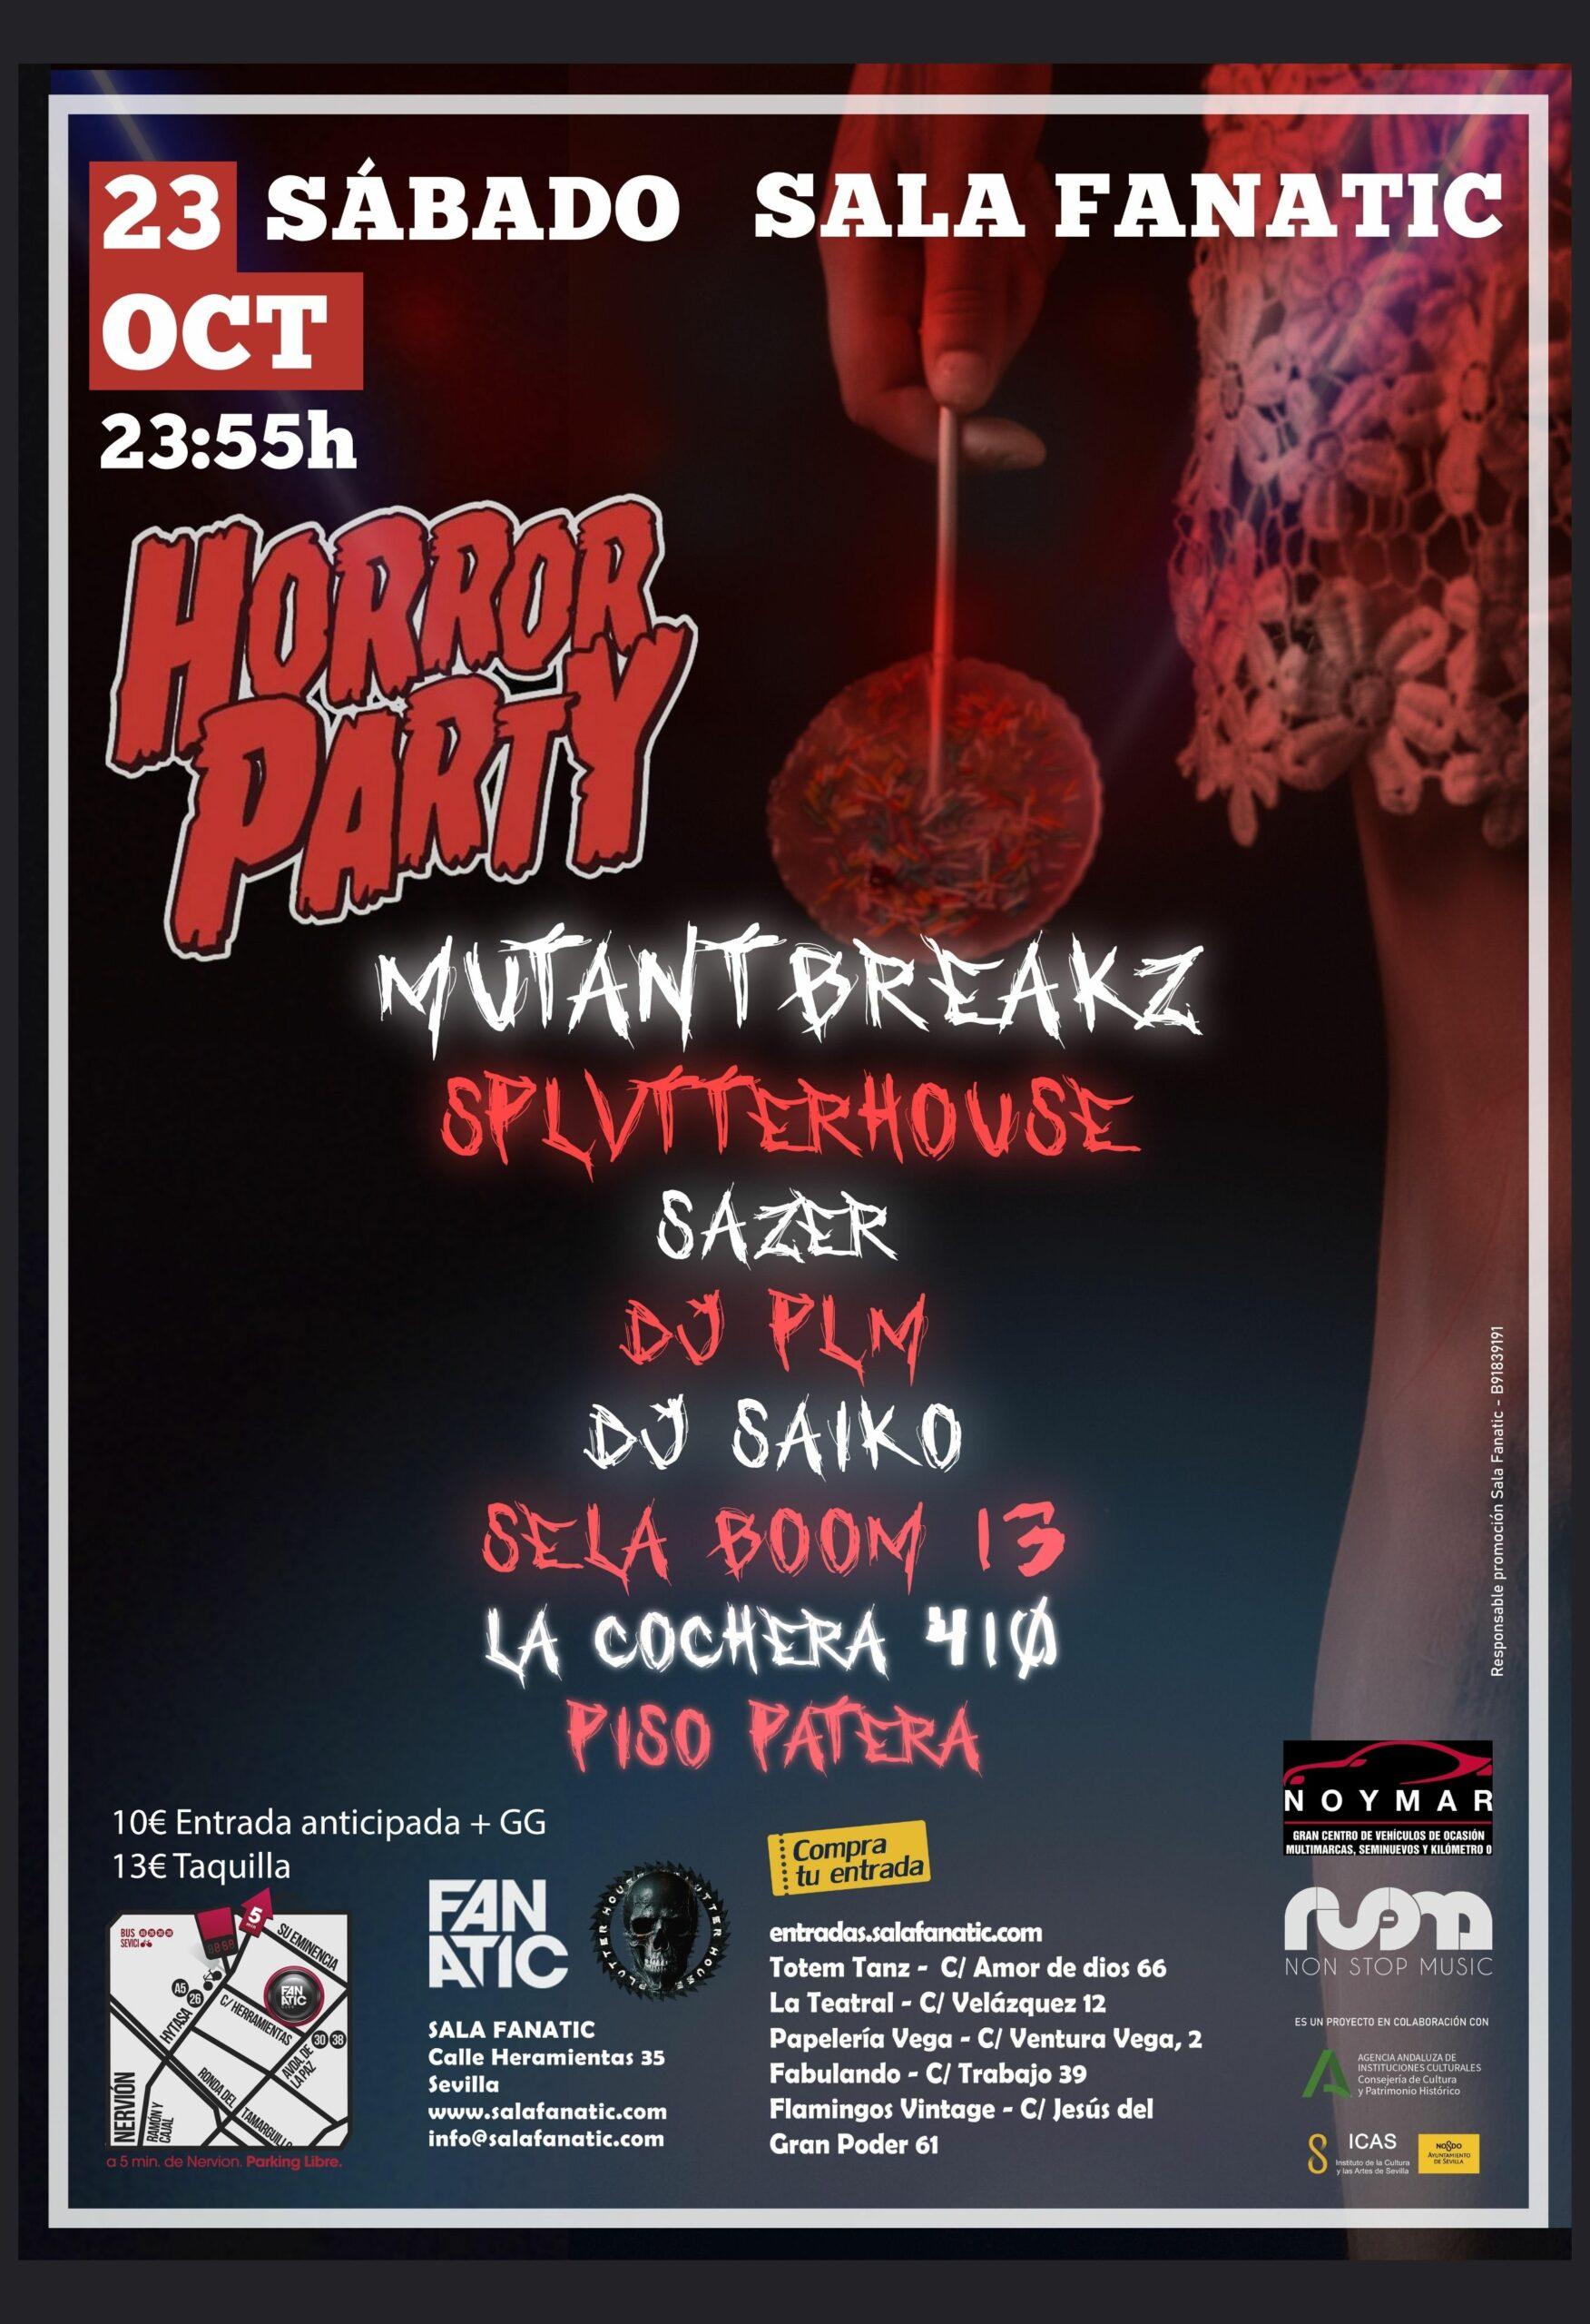 Horror Party fiesta halloween en Sevilla